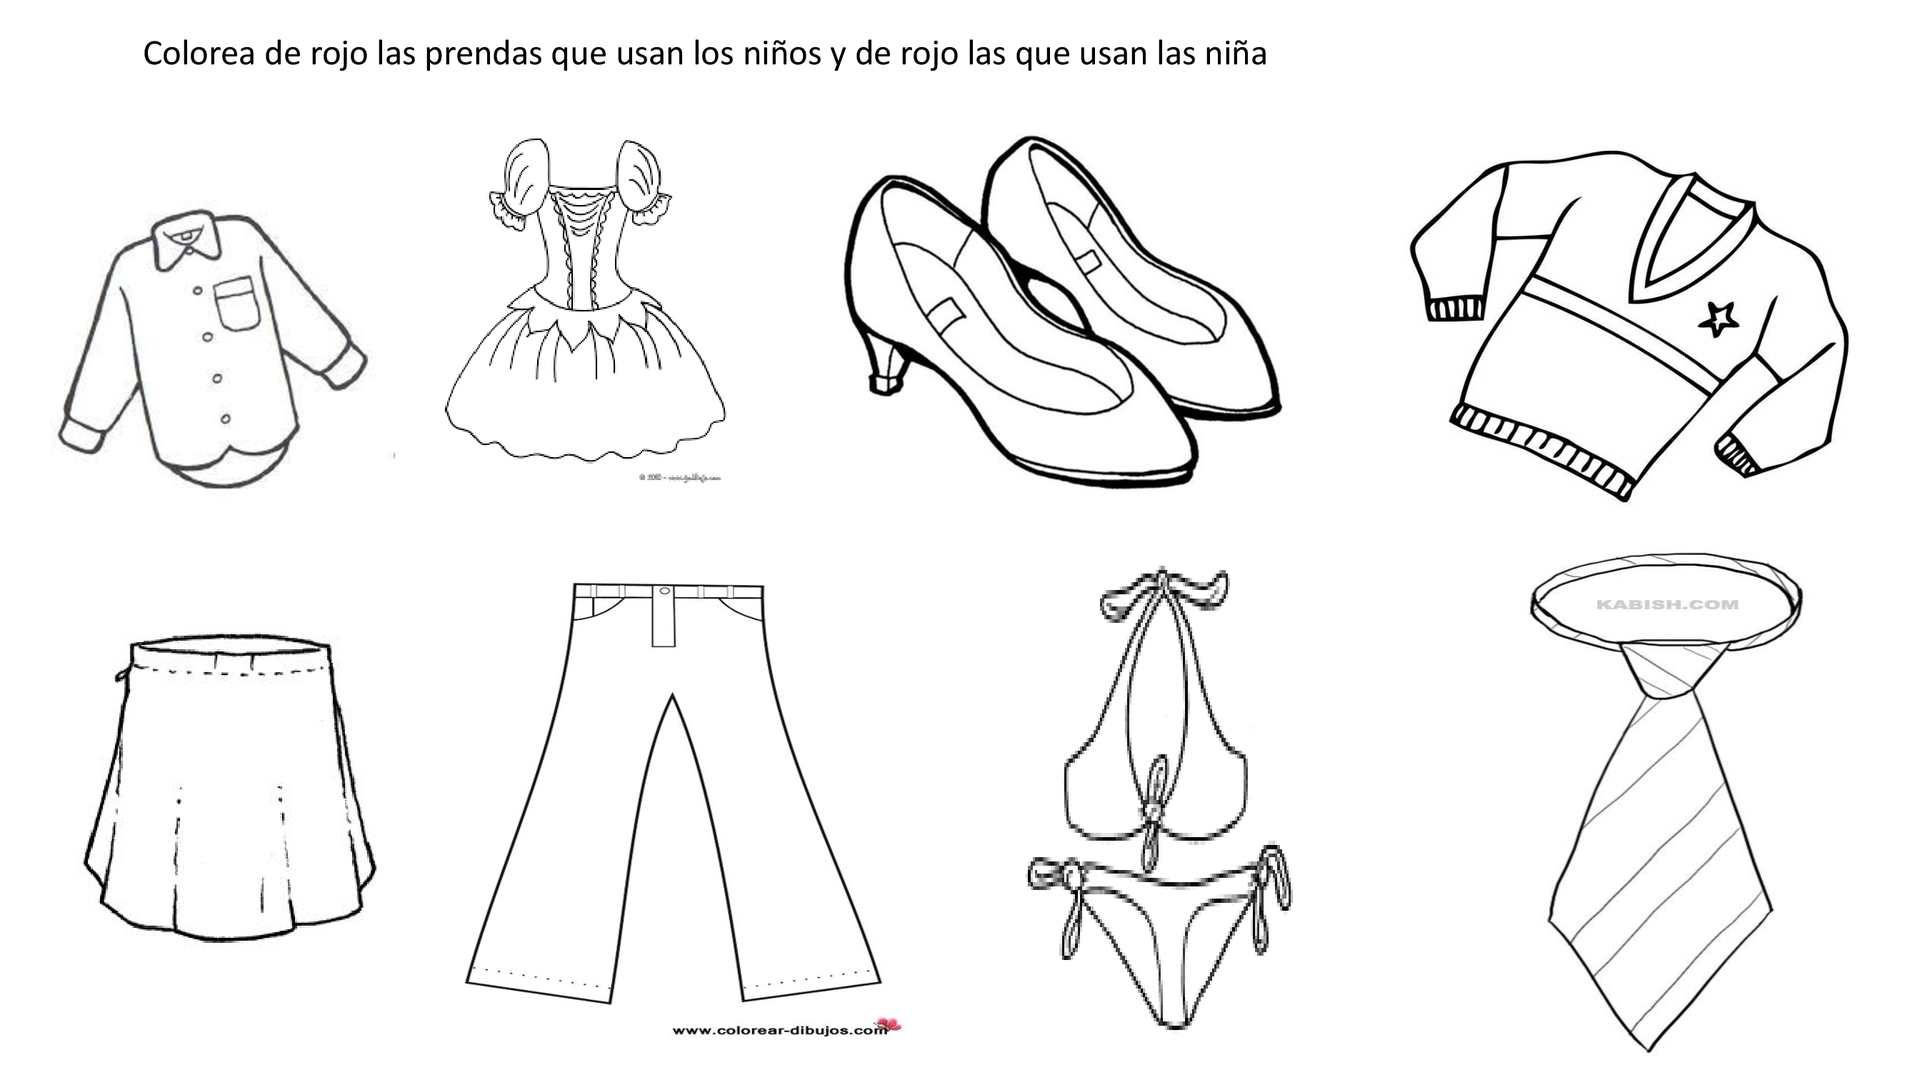 Dibujos De Vestidos Para Colorear E Imprimir: Laminas Para Colorear Prendas De Vestir